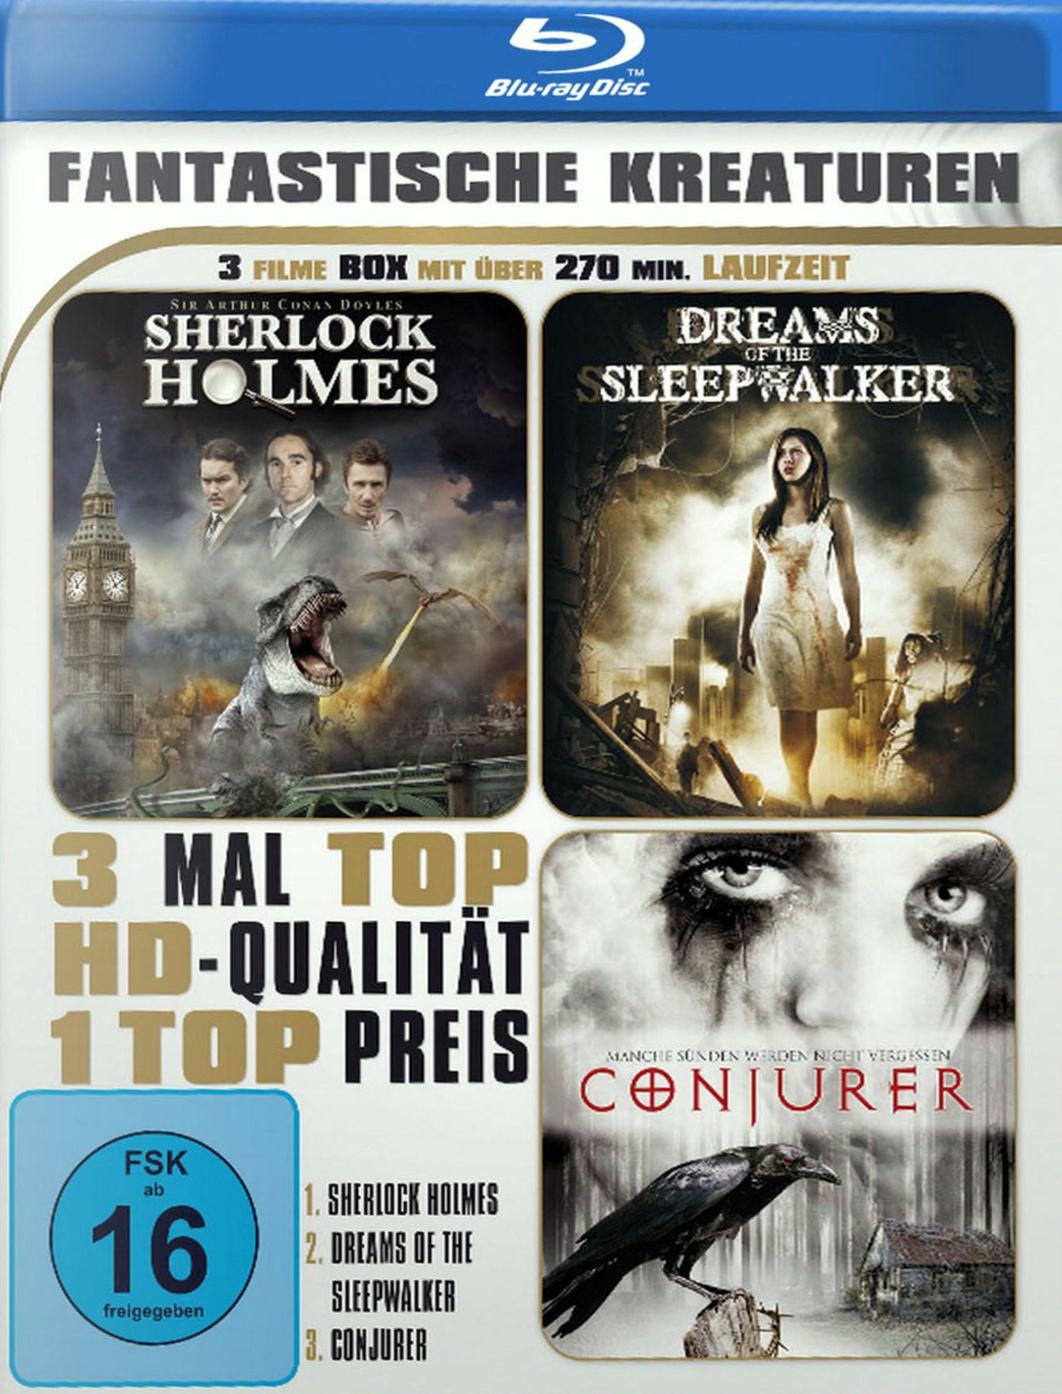 Fantastische Kreaturen (3 Filme)